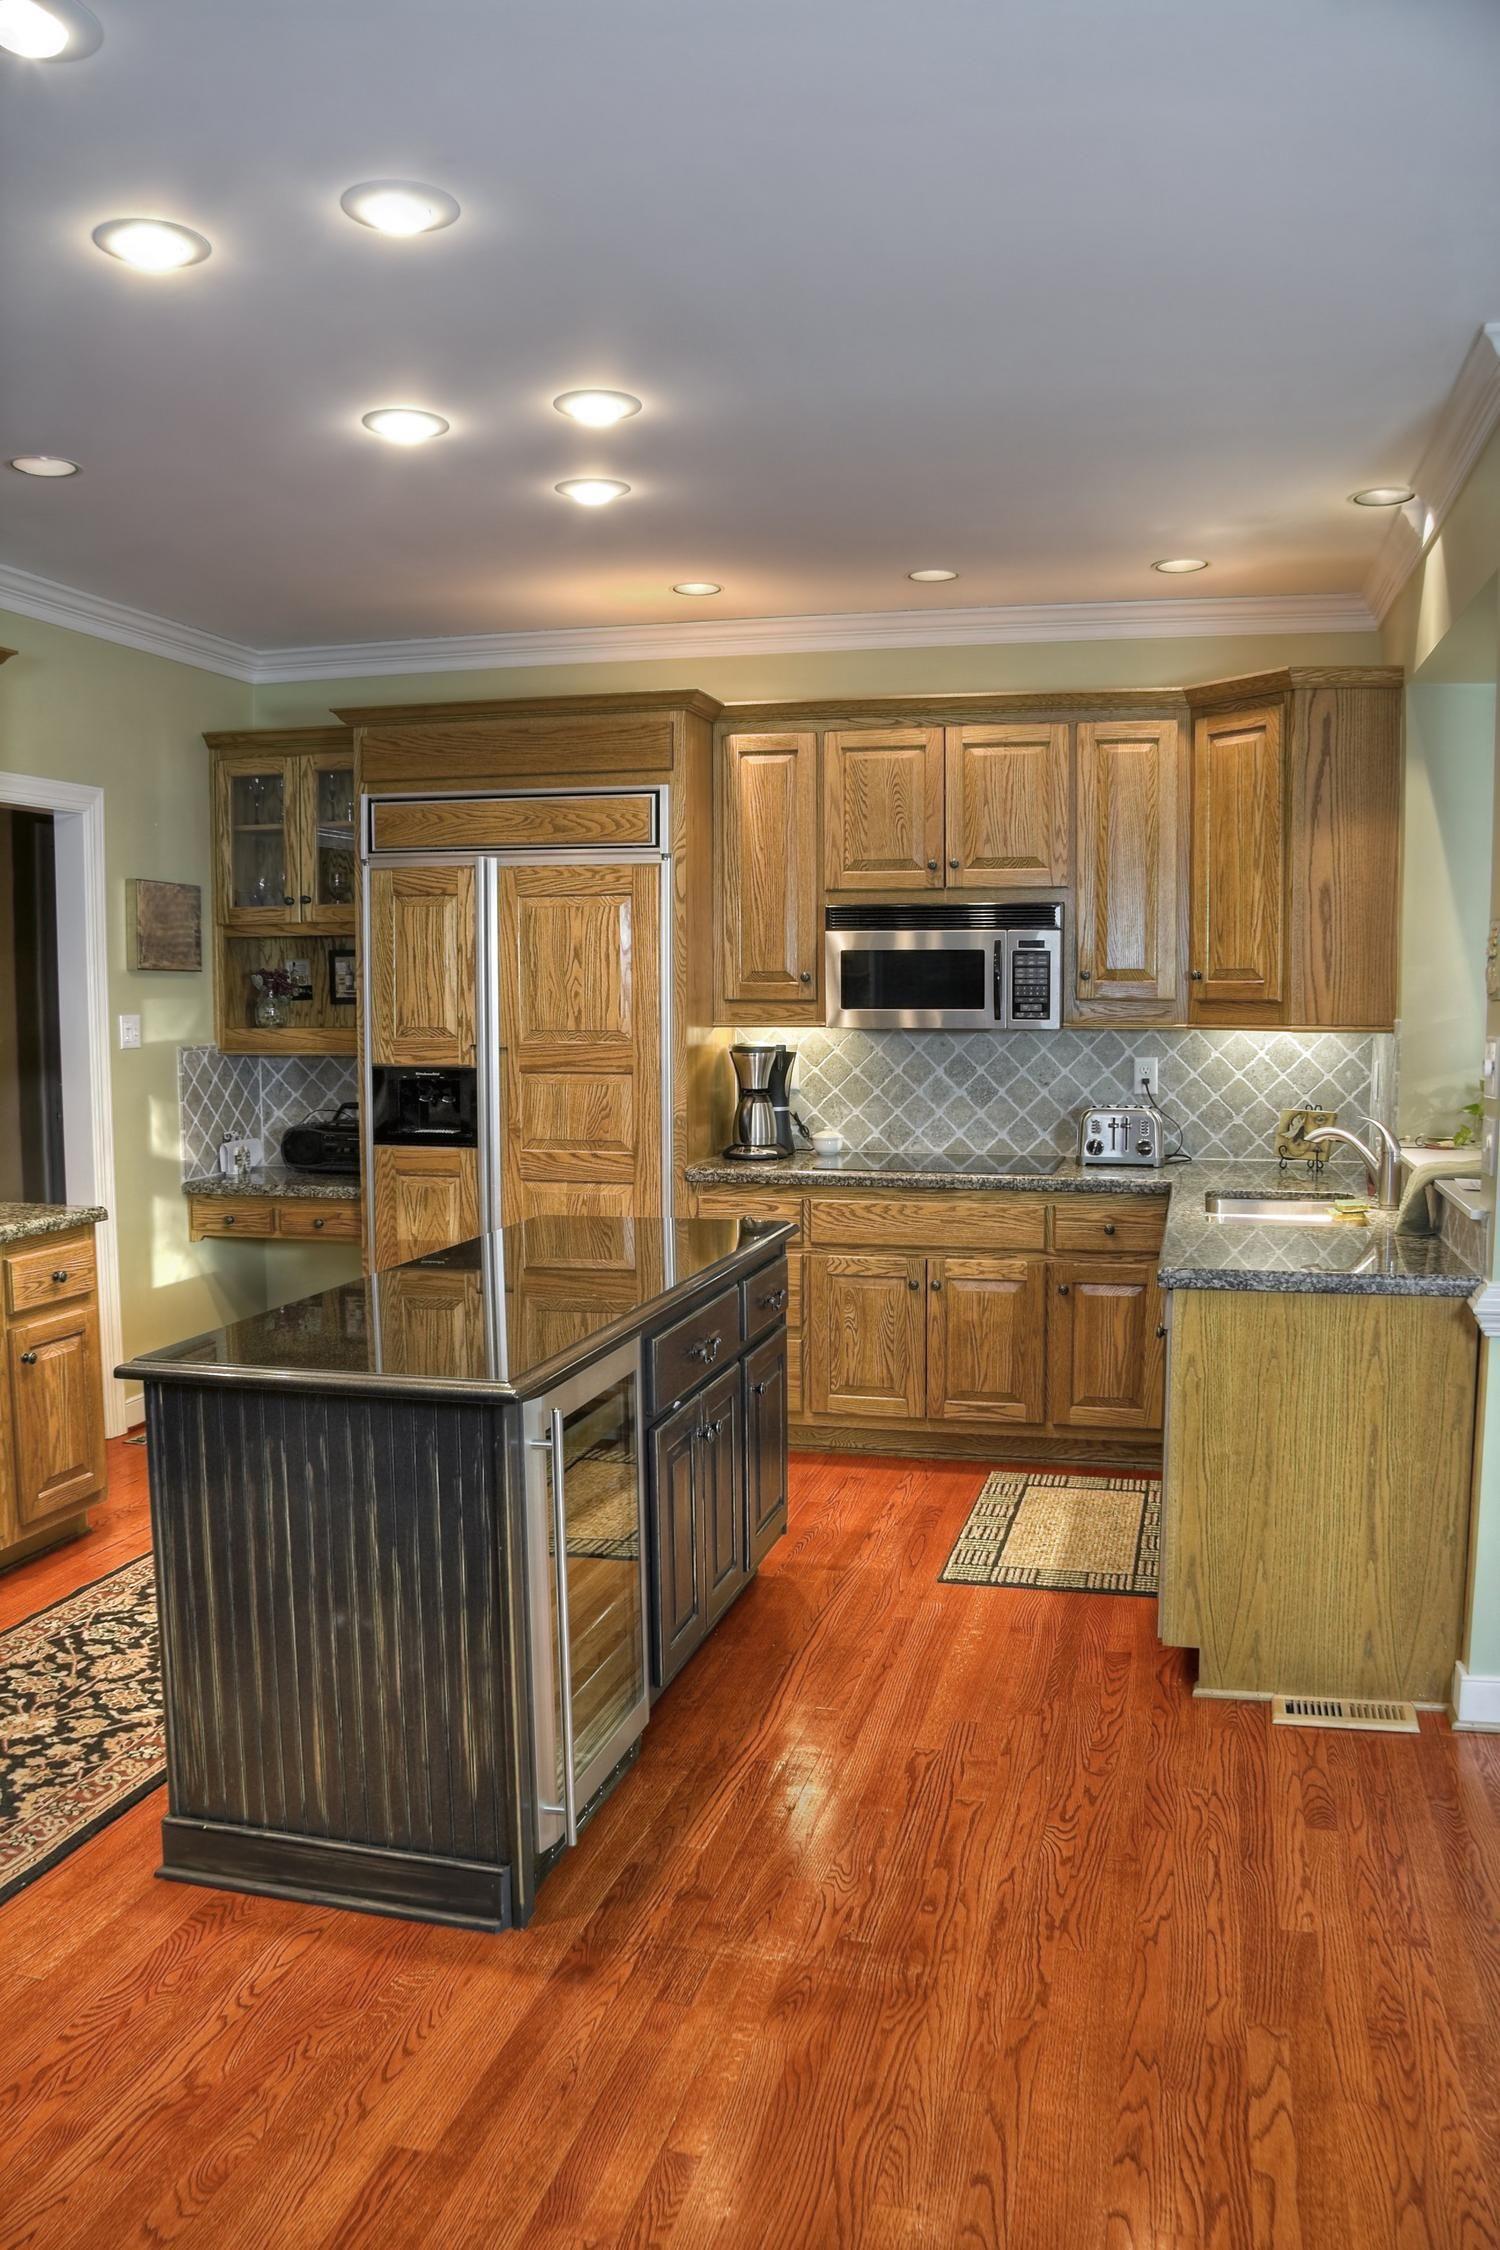 Gunstock Oak Solid Hardwood Floor Decor Interior Design Kitchen Solid Hardwood Floors Kitchen Design